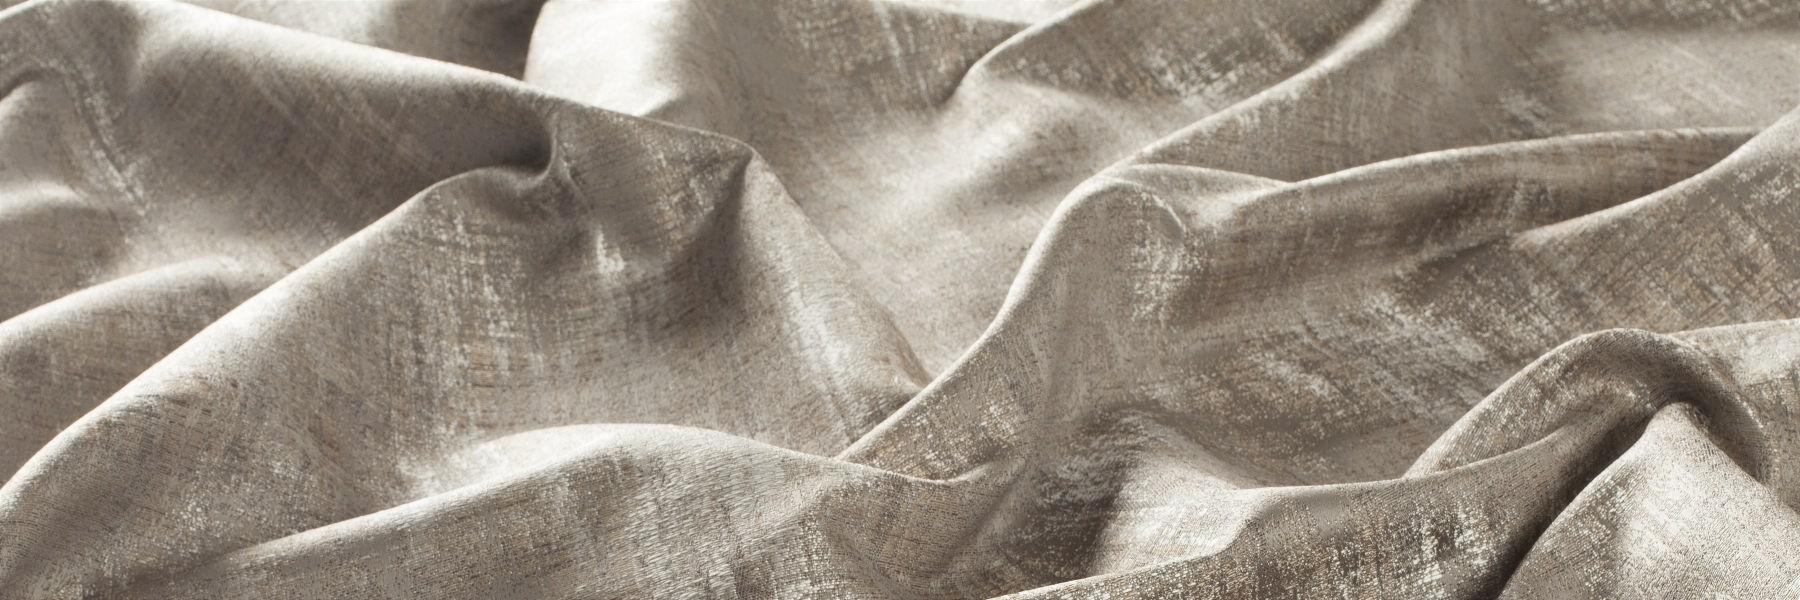 Decoration Fabric Kalahari 9 7877 020 Jab Anstoetz Fabrics